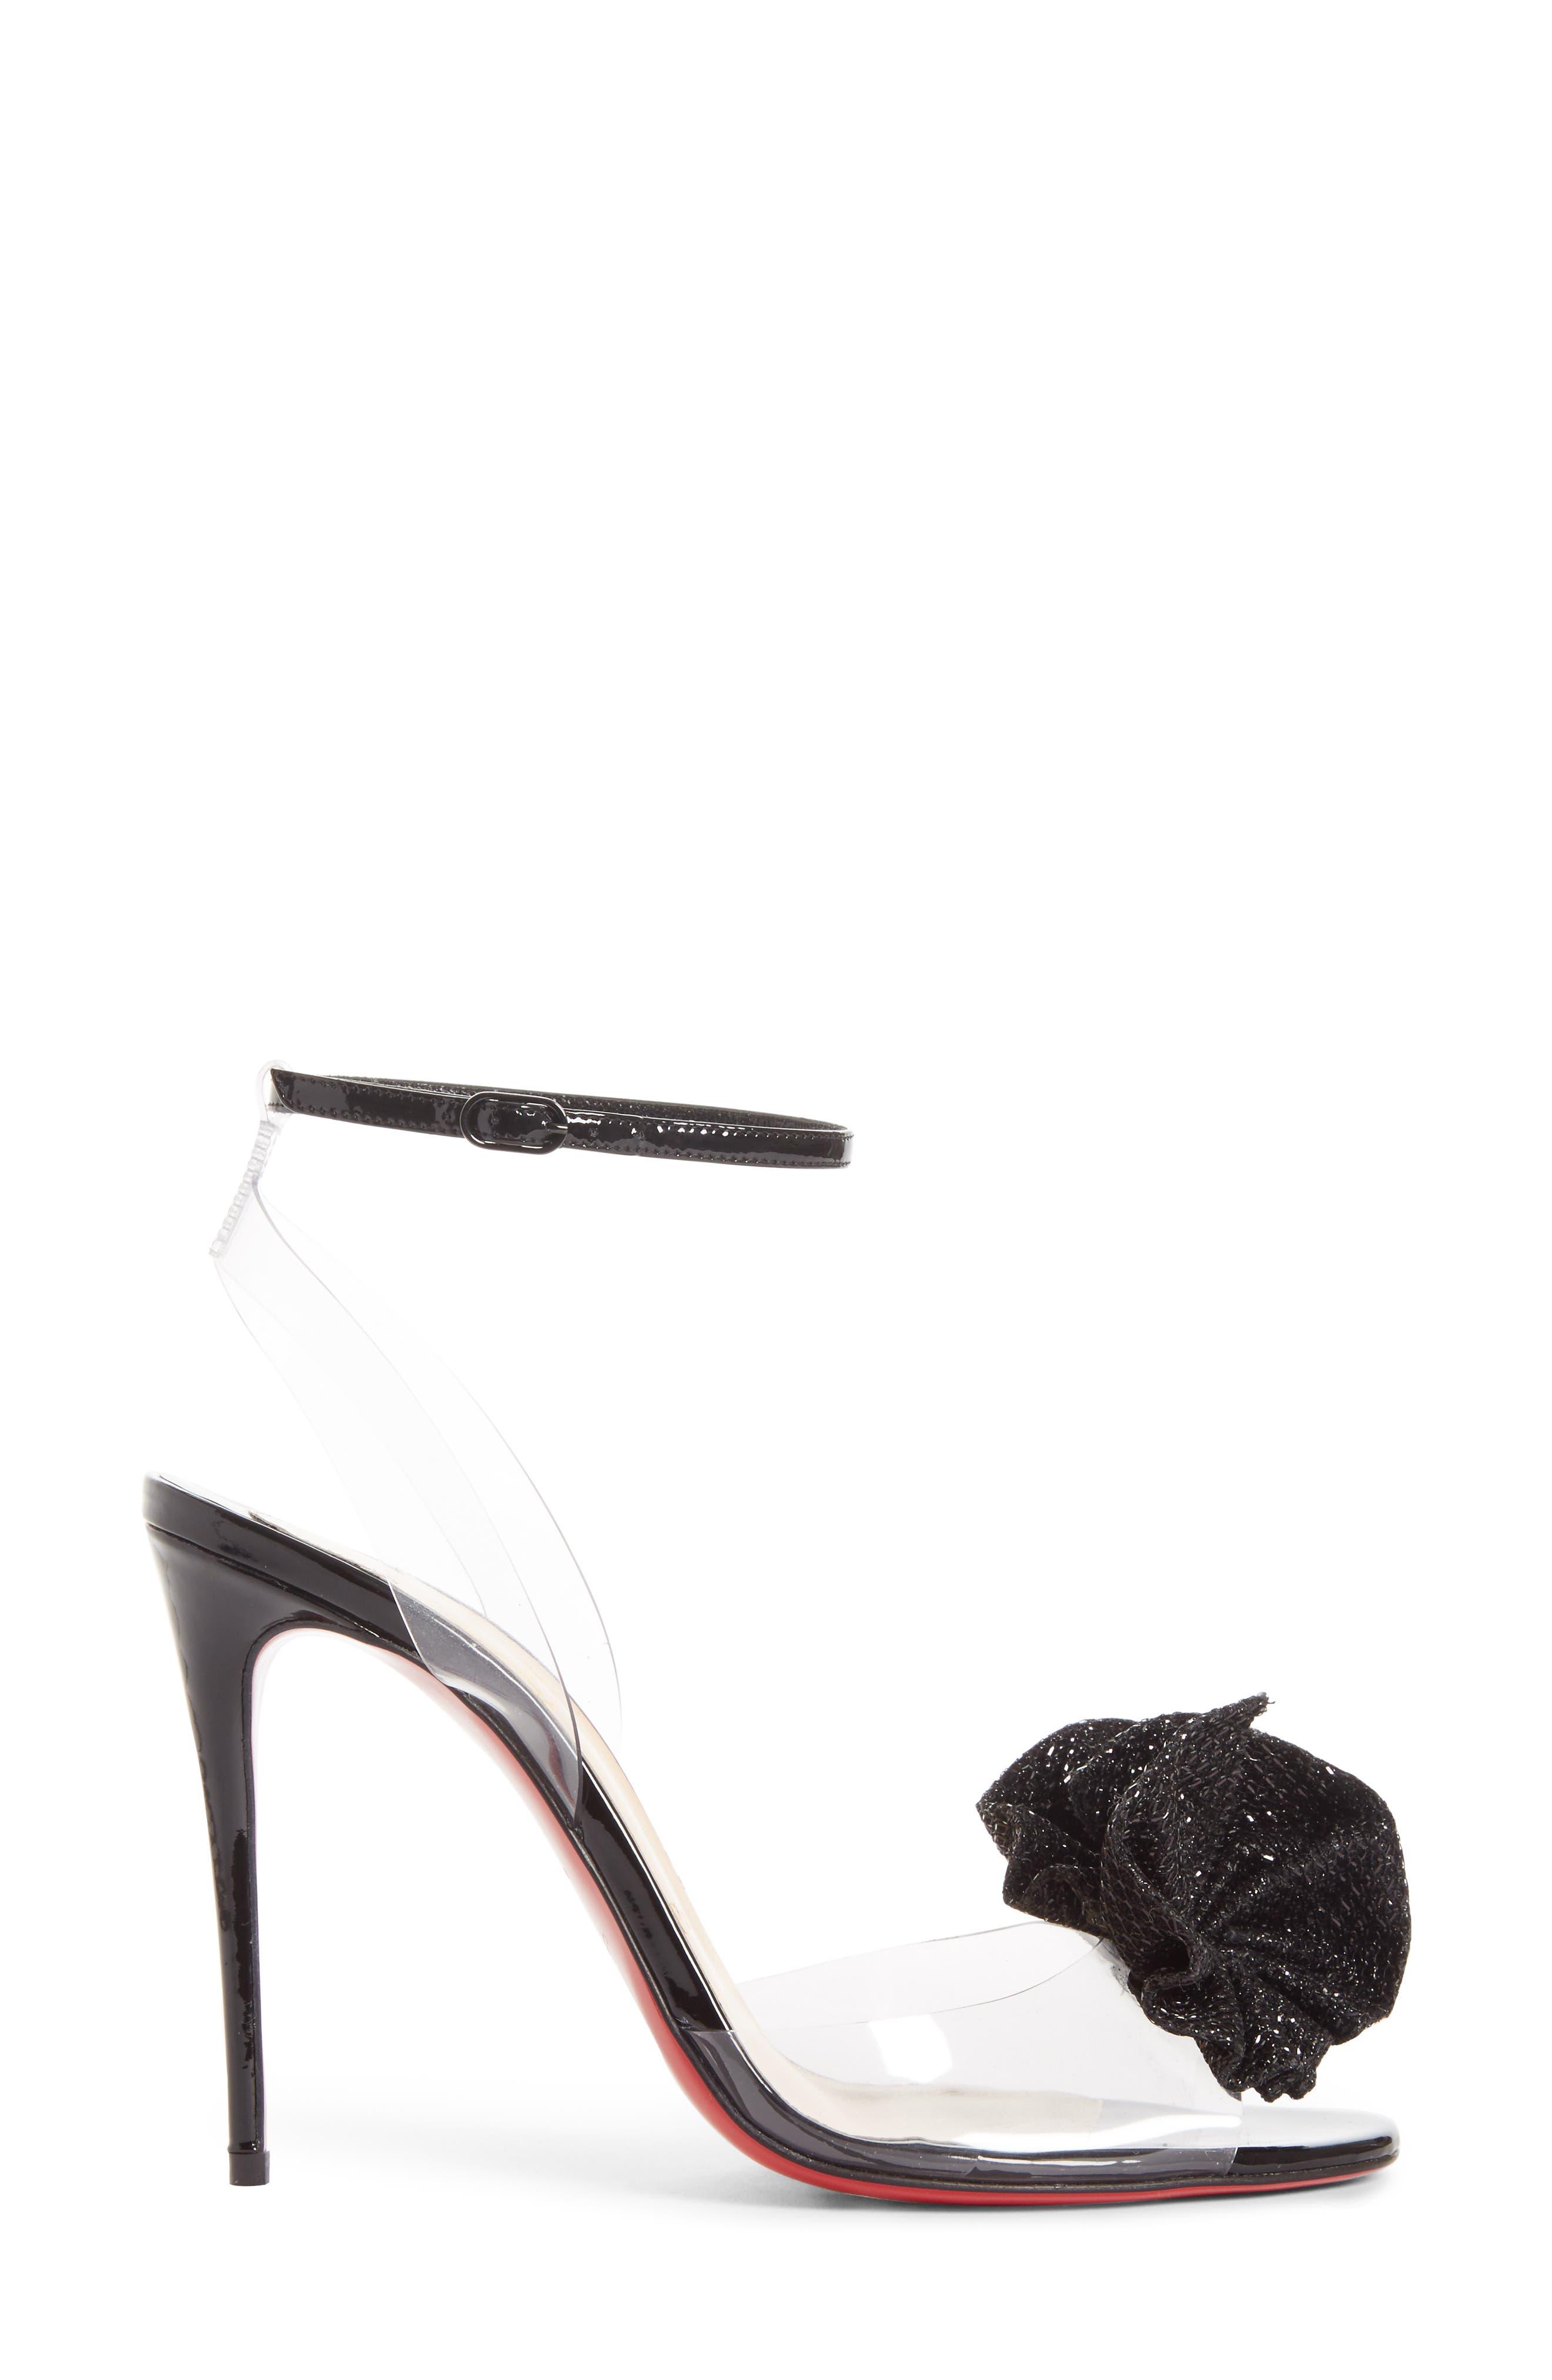 Fossiliza Clear Ankle Strap Sandal,                             Alternate thumbnail 3, color,                             Black/ Transparent